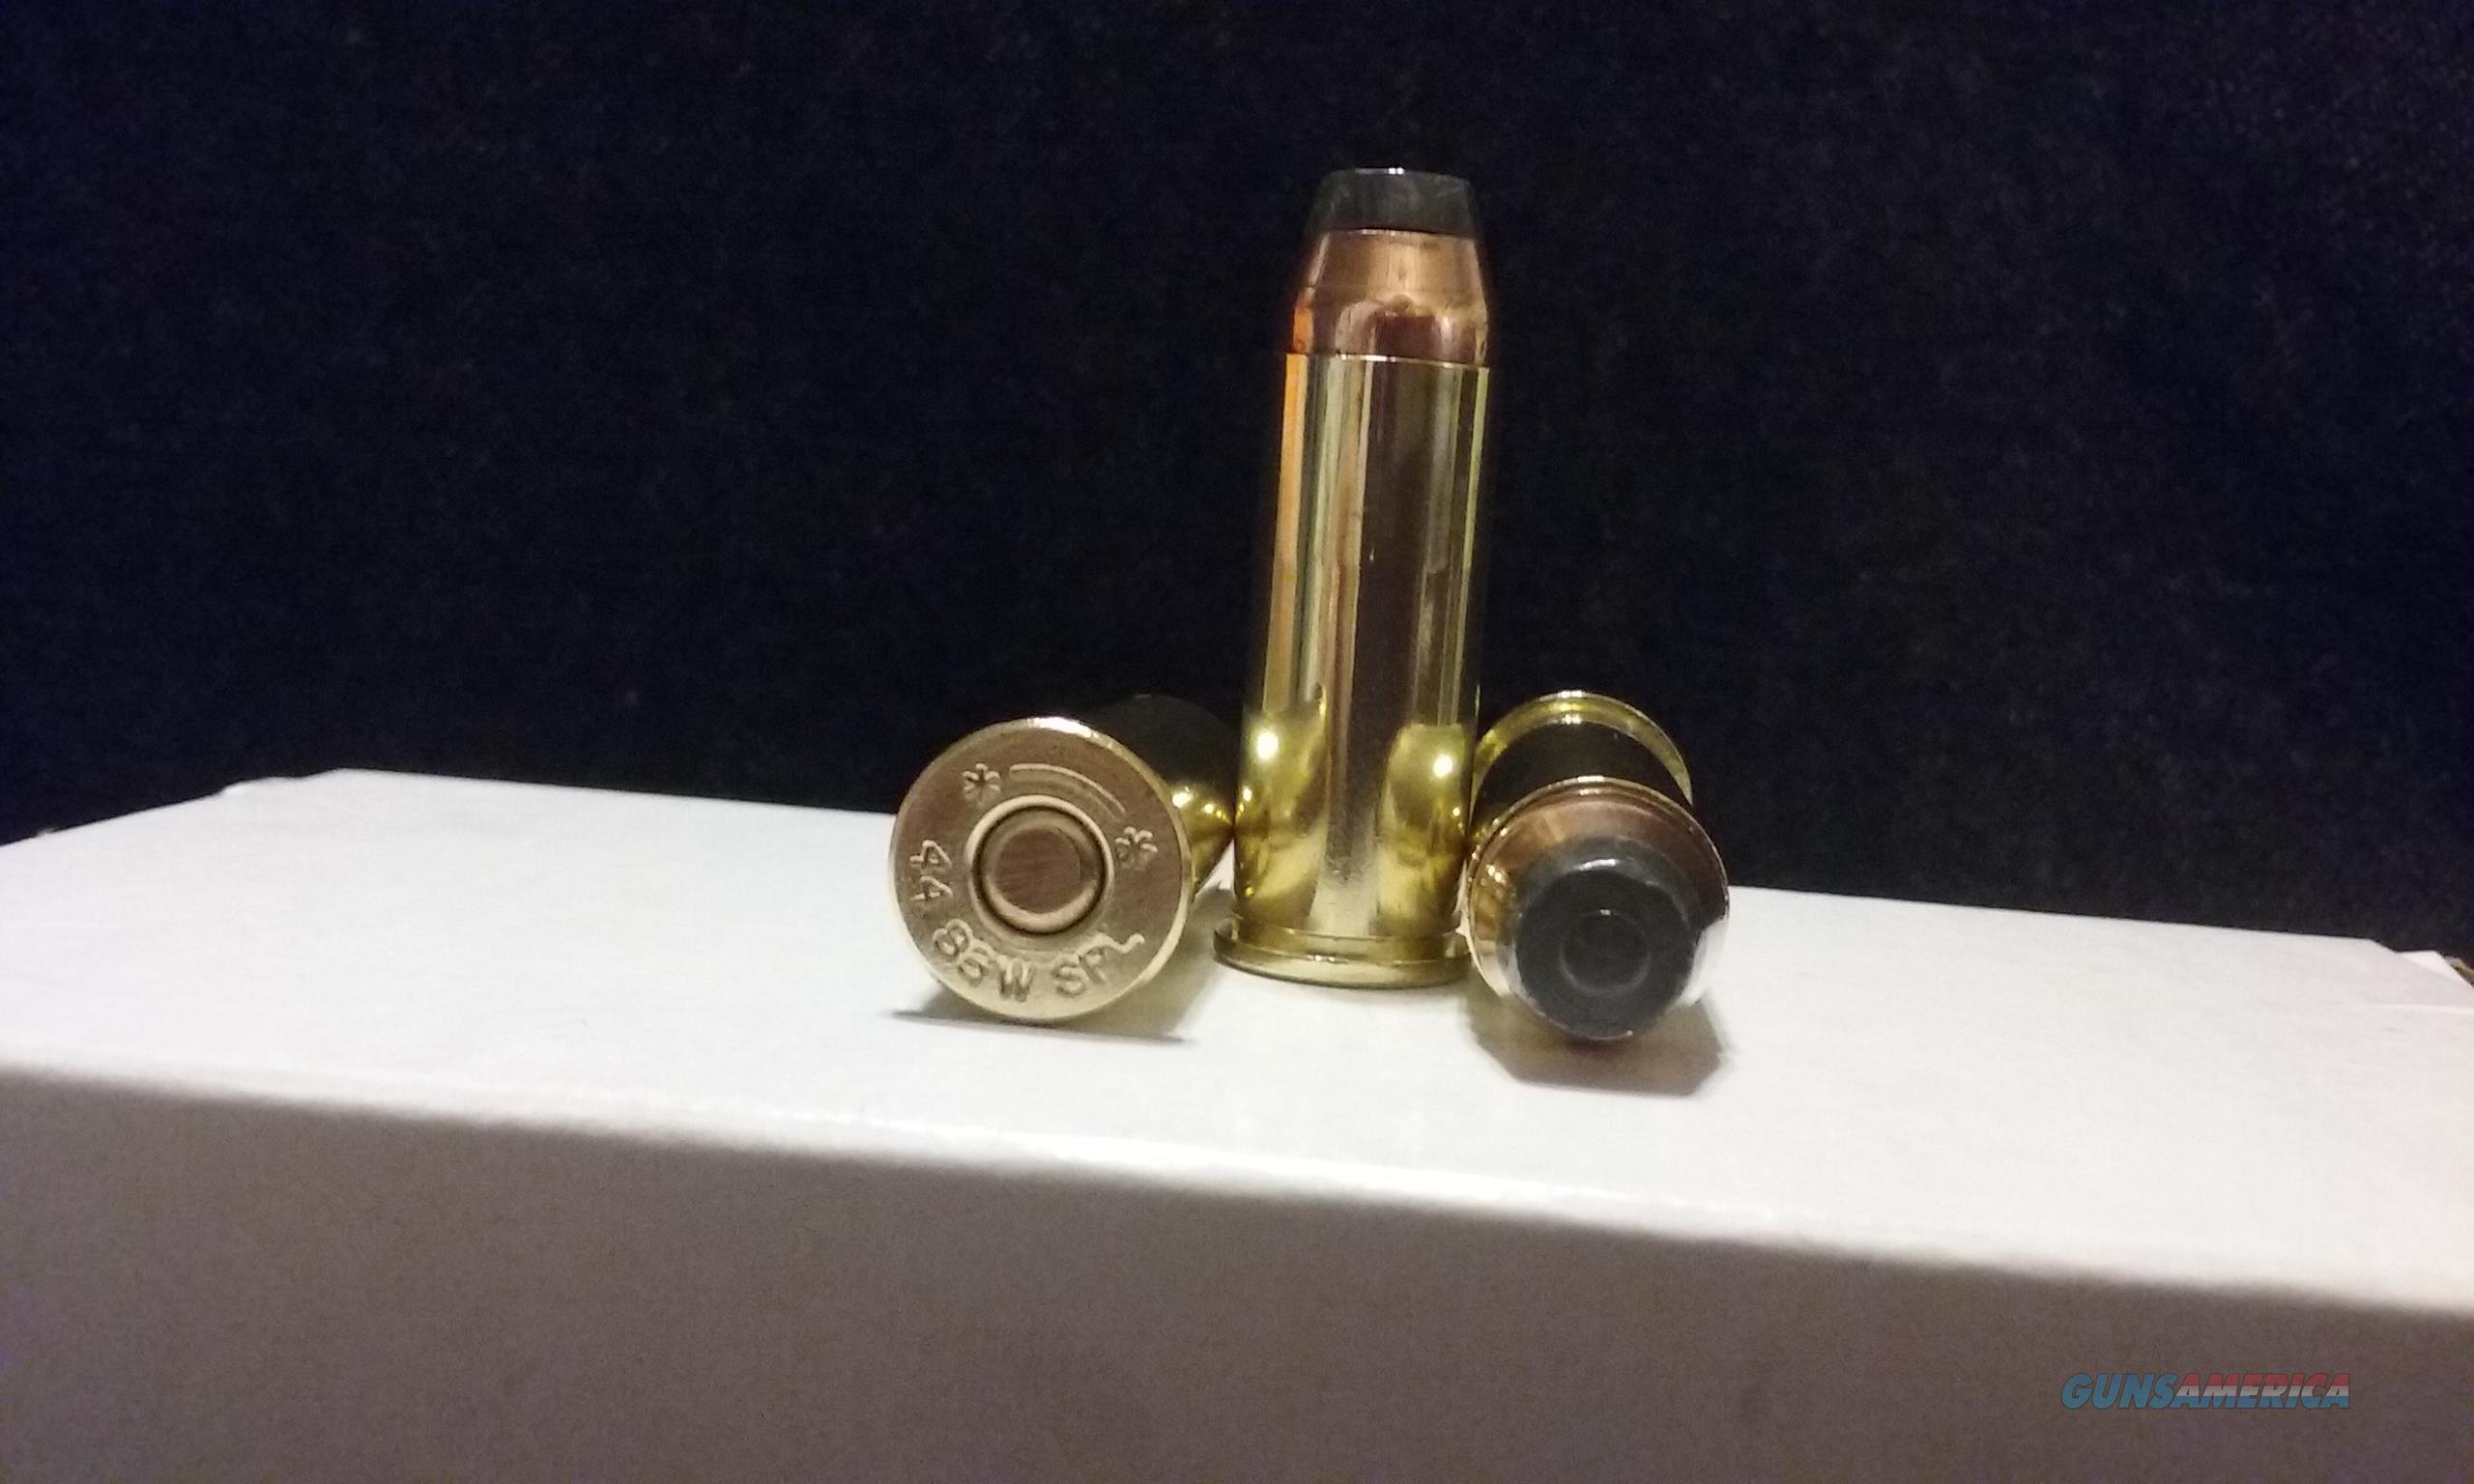 44 S&W Special Ammo.  Non-Guns > Ammunition